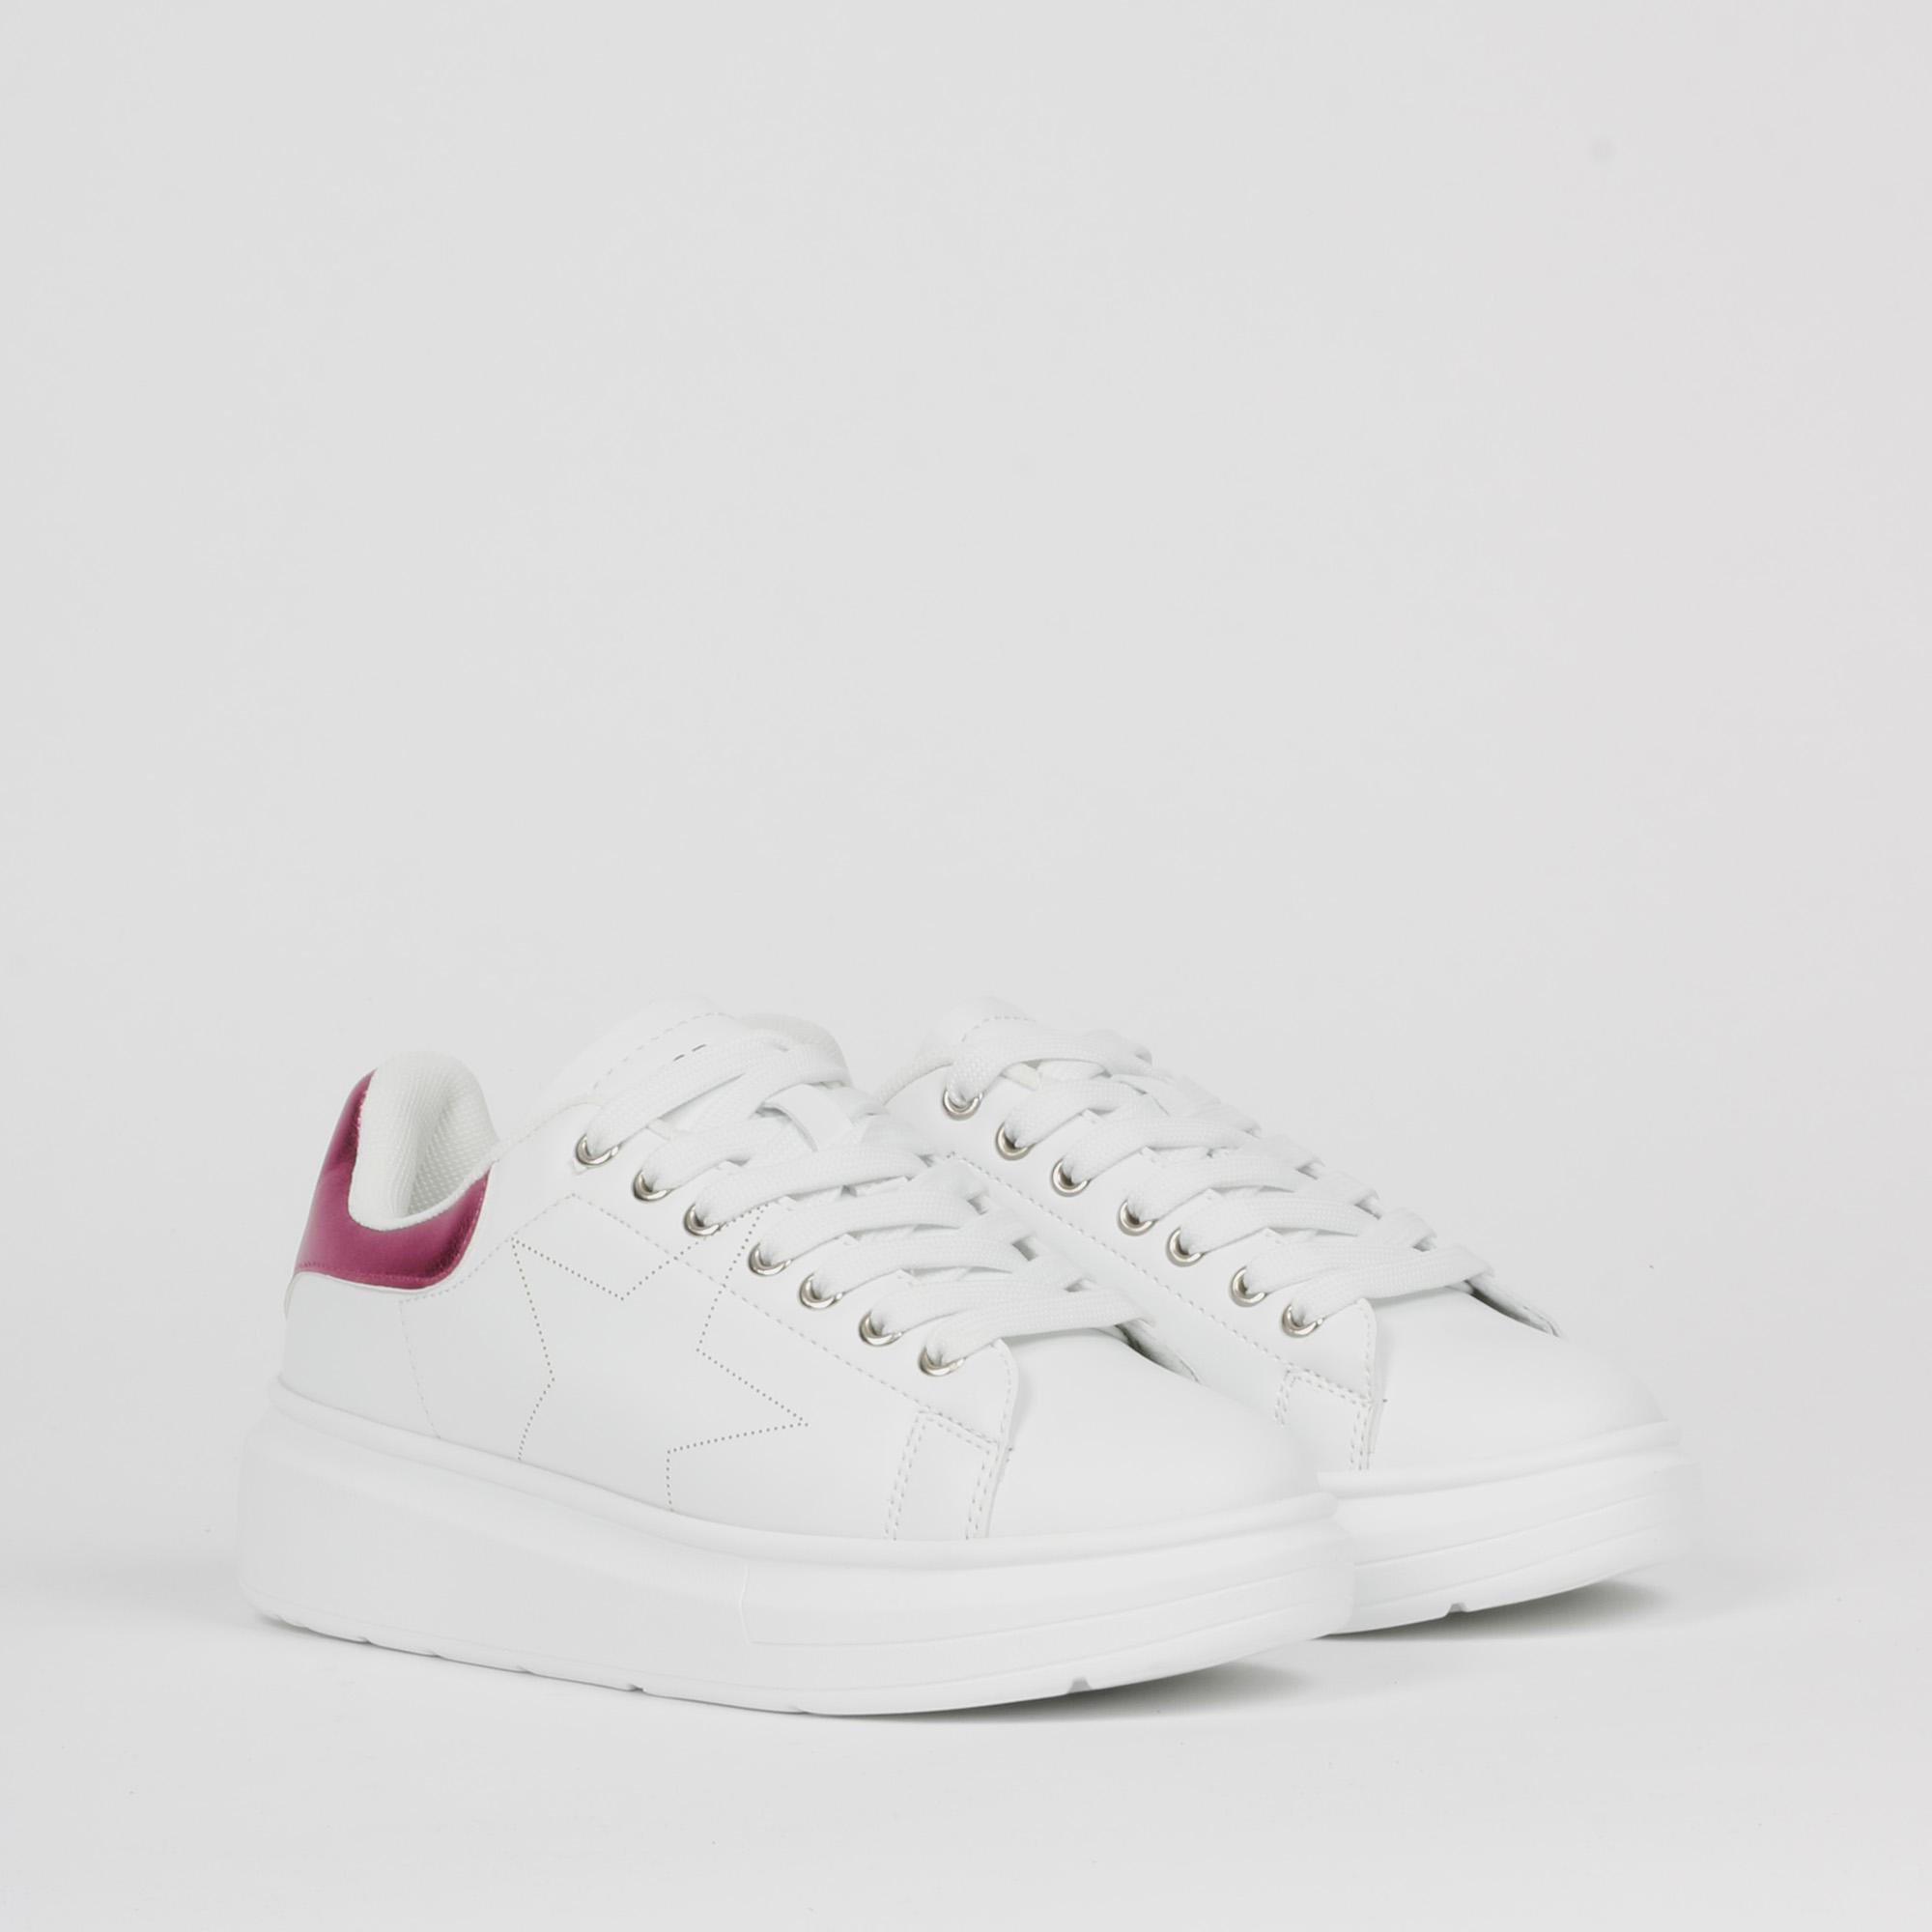 Sneakers inserto metal fucsia - Bianco